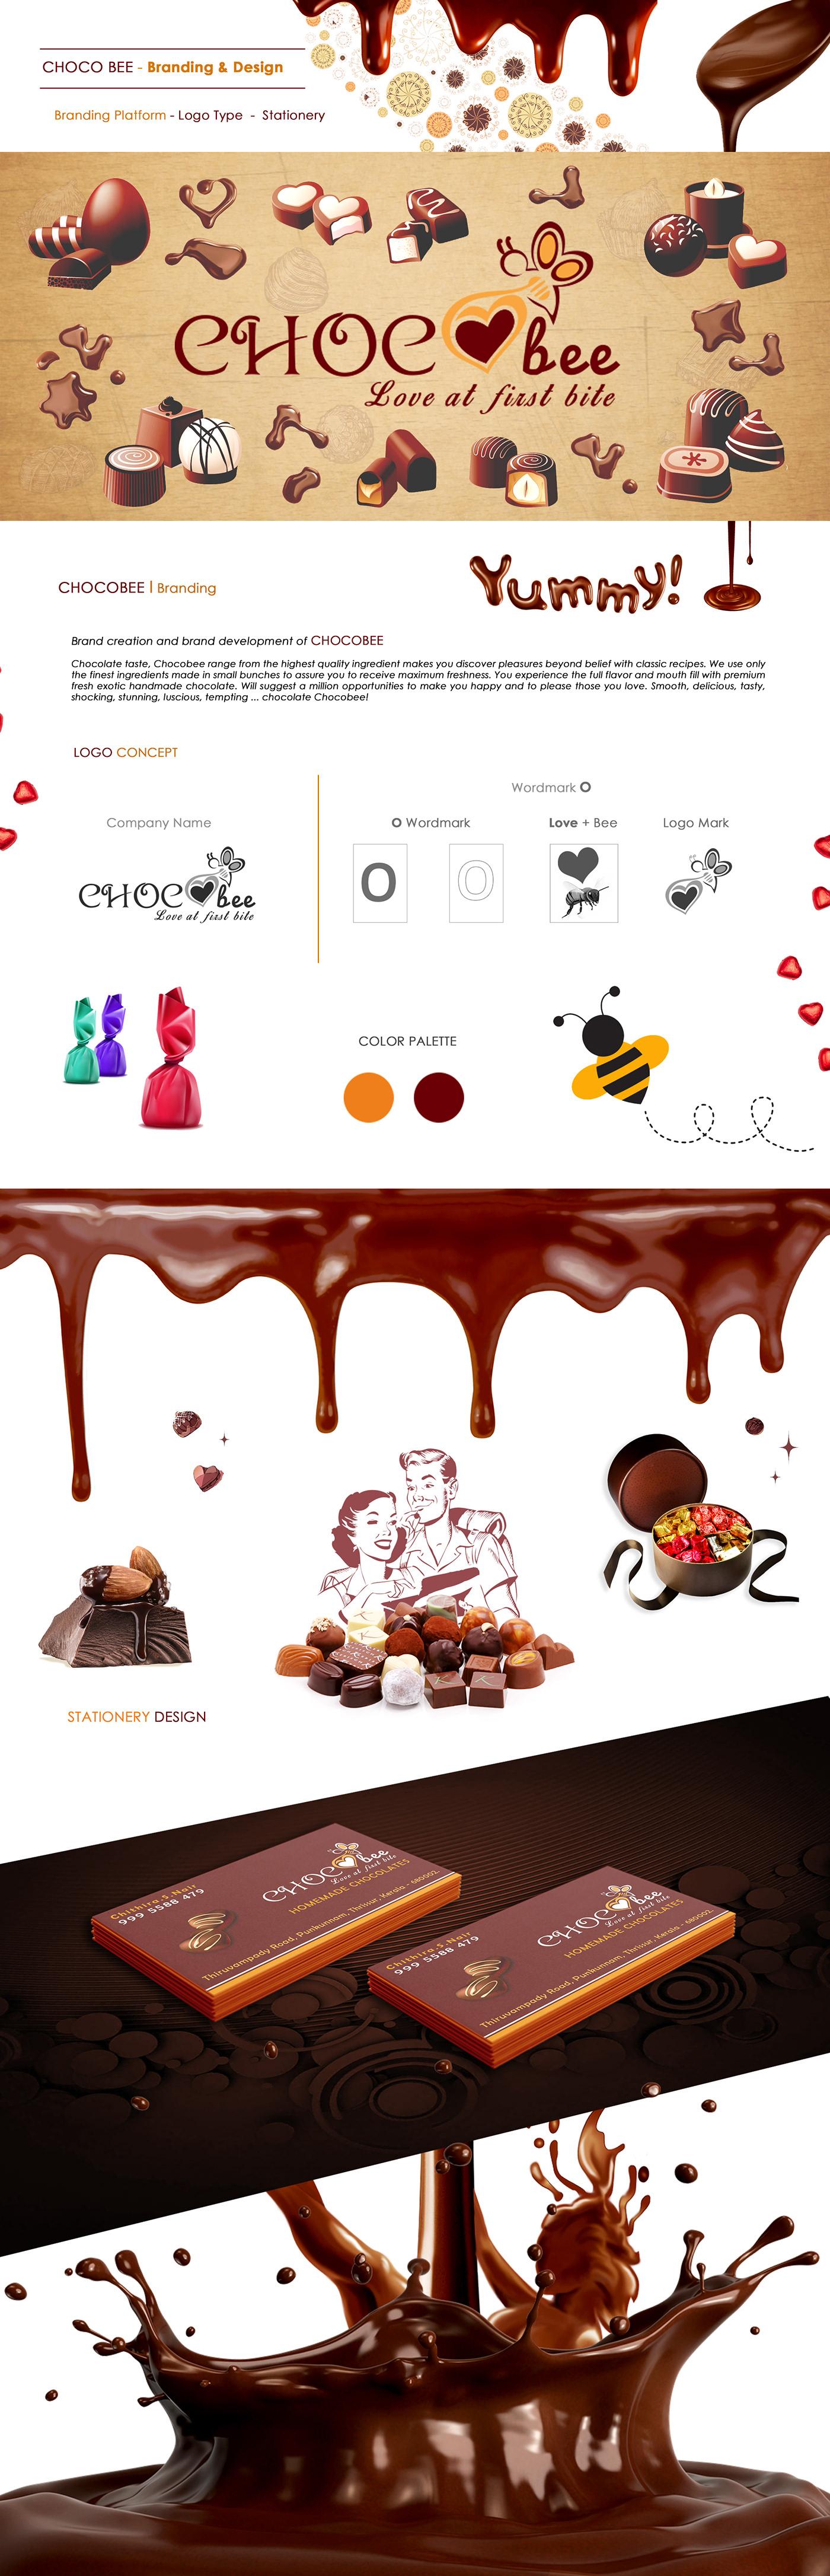 chocolate branding  ILLUSTRATION  graphics flavor discover color print concept idea